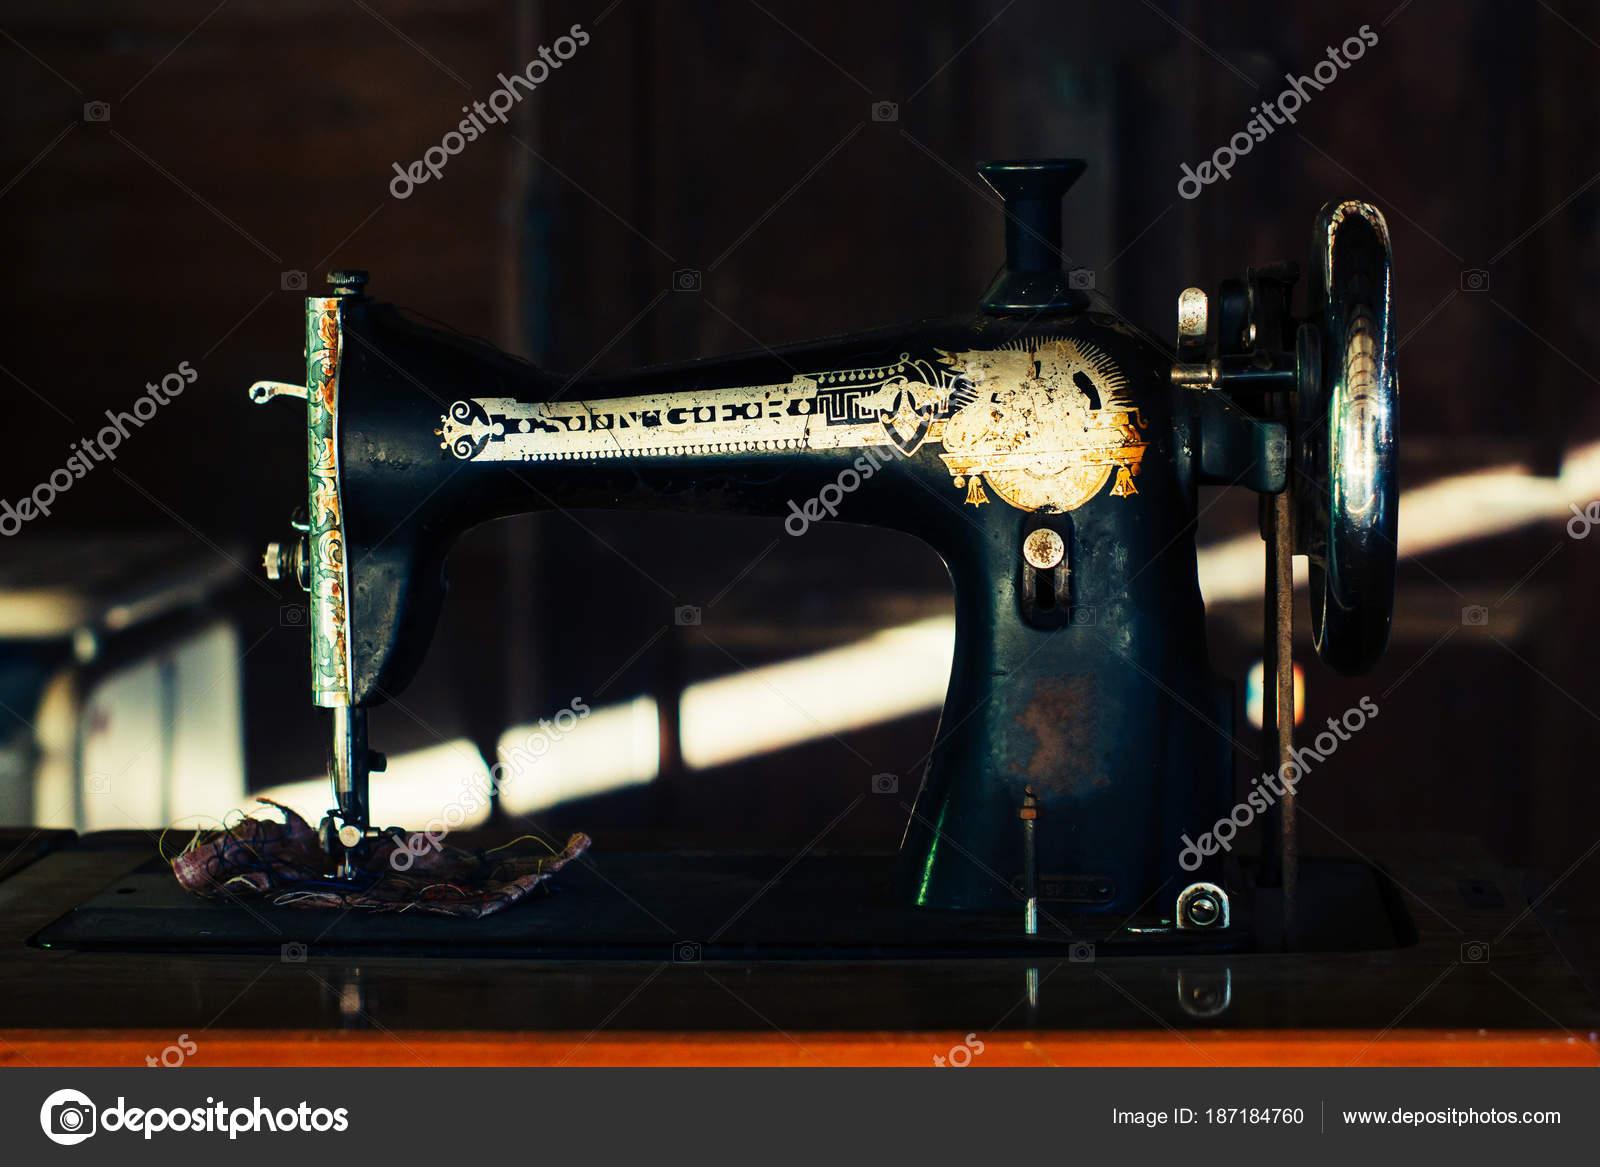 alte Nähmaschine — Stockfoto © Yuthana_stock #187184760